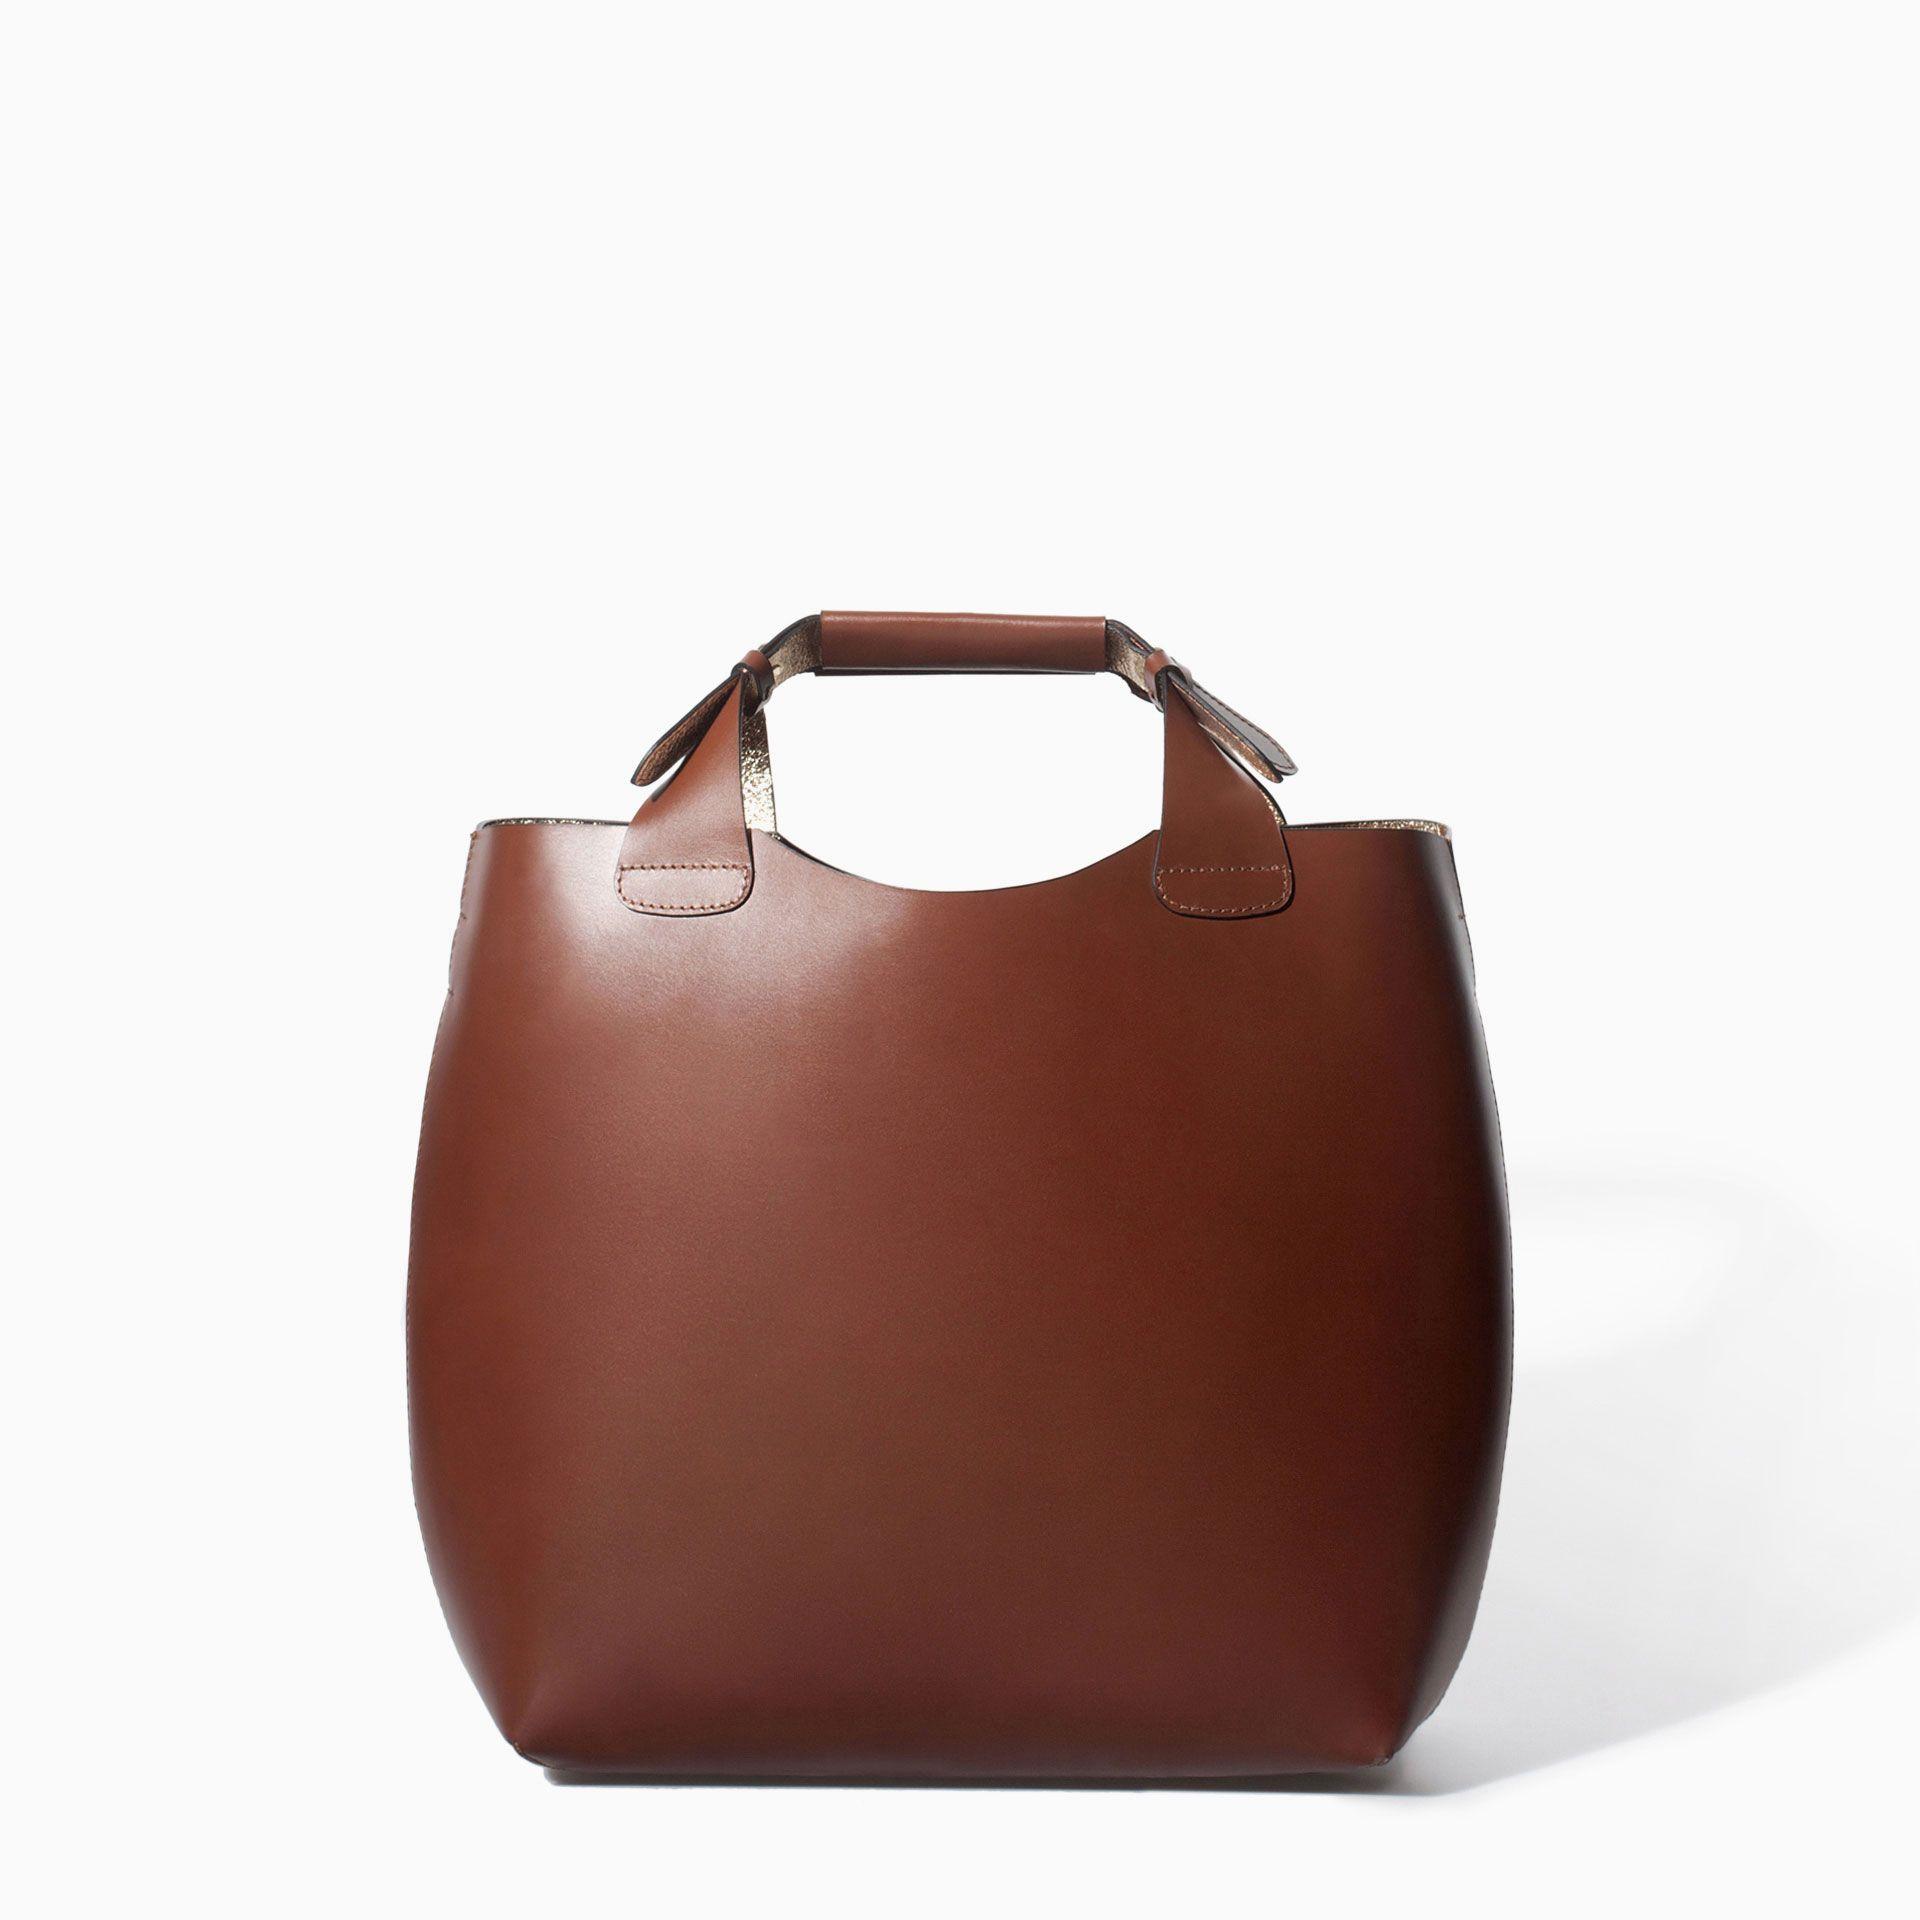 483e4c45675 LEATHER SHOPPER WITH LAMINATED INTERIOR - Handbags - WOMAN   ZARA Jordan    129.00 JOD